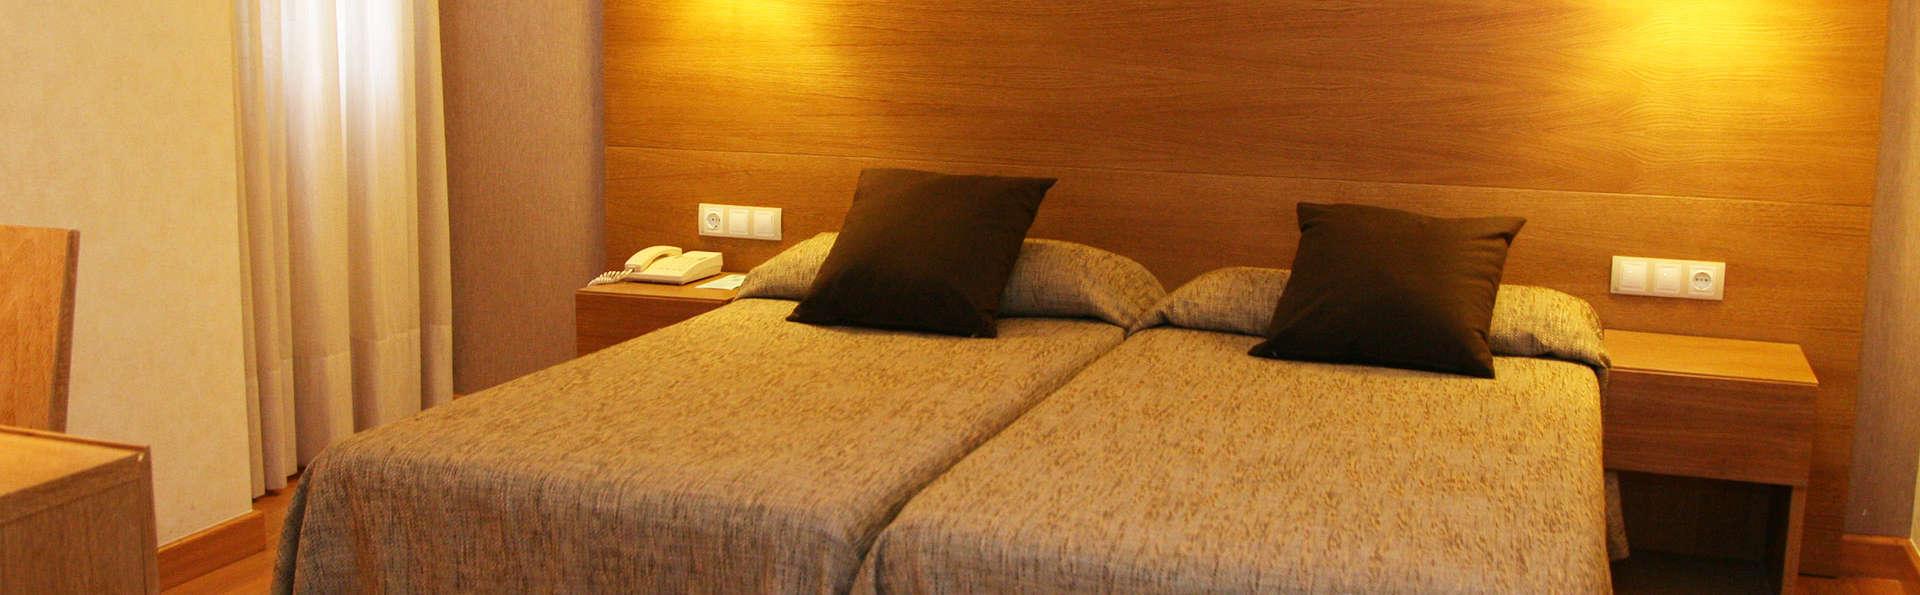 Hotel Don Paco - EDIT_room1.jpg